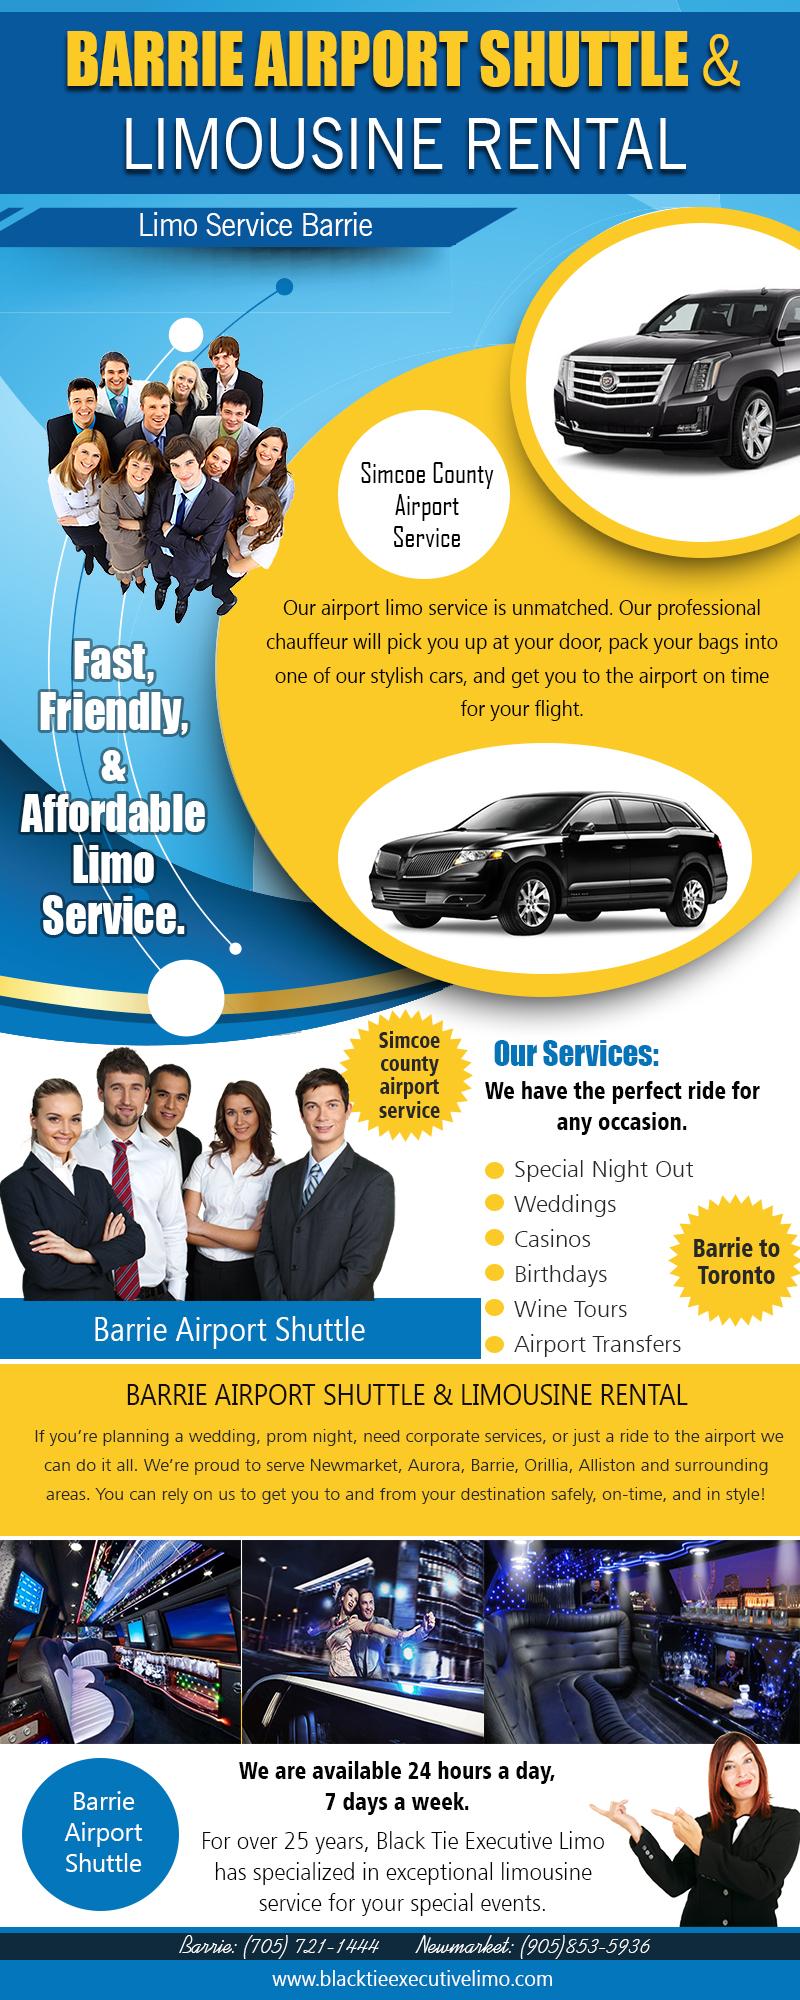 Barrie Limousine | Call – 705-721-1444 | blacktieexecutivelimo.com